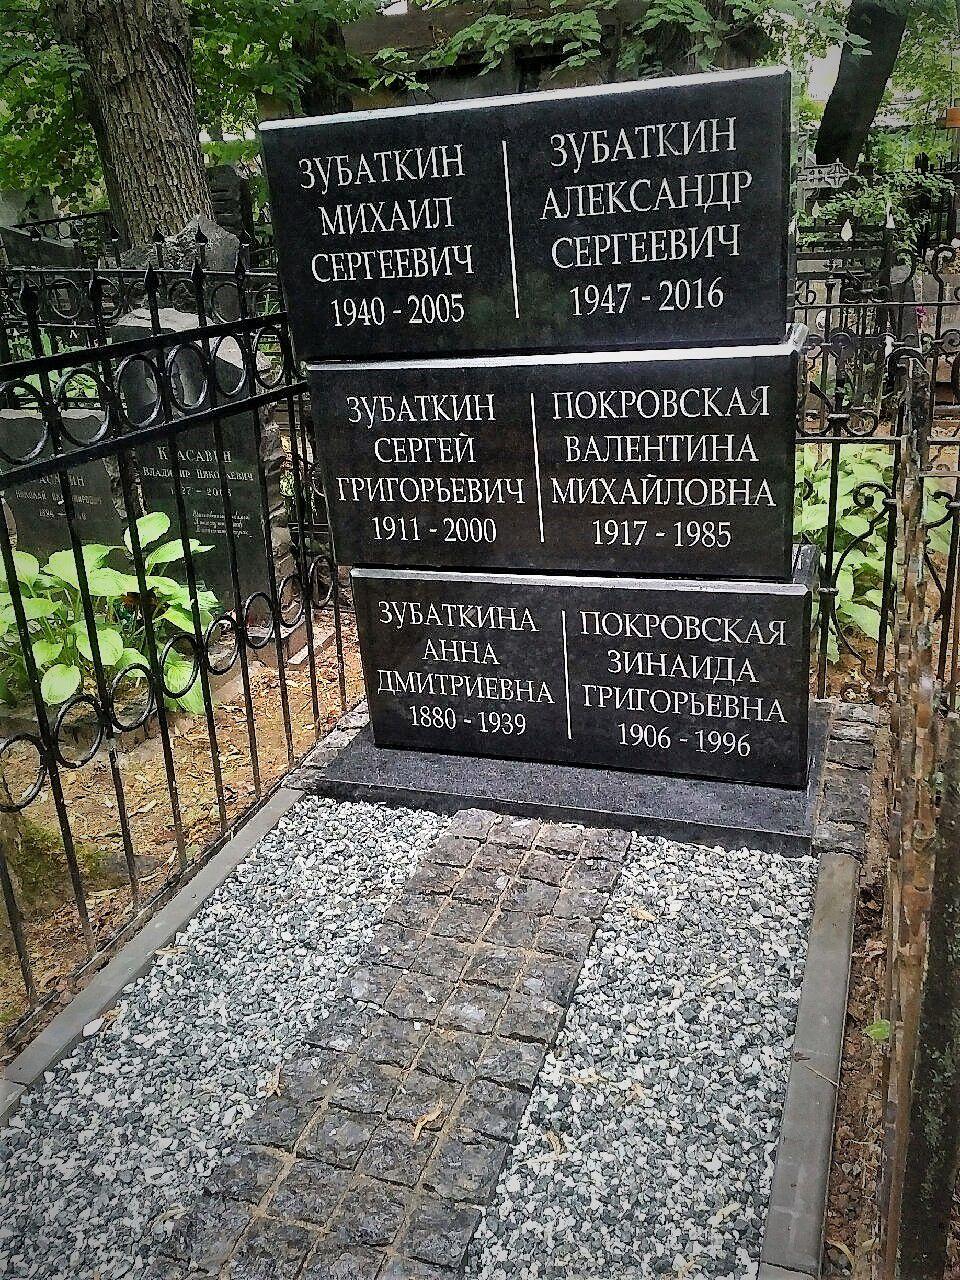 Установлен на Введенском кл., г. Москва.Мемориал